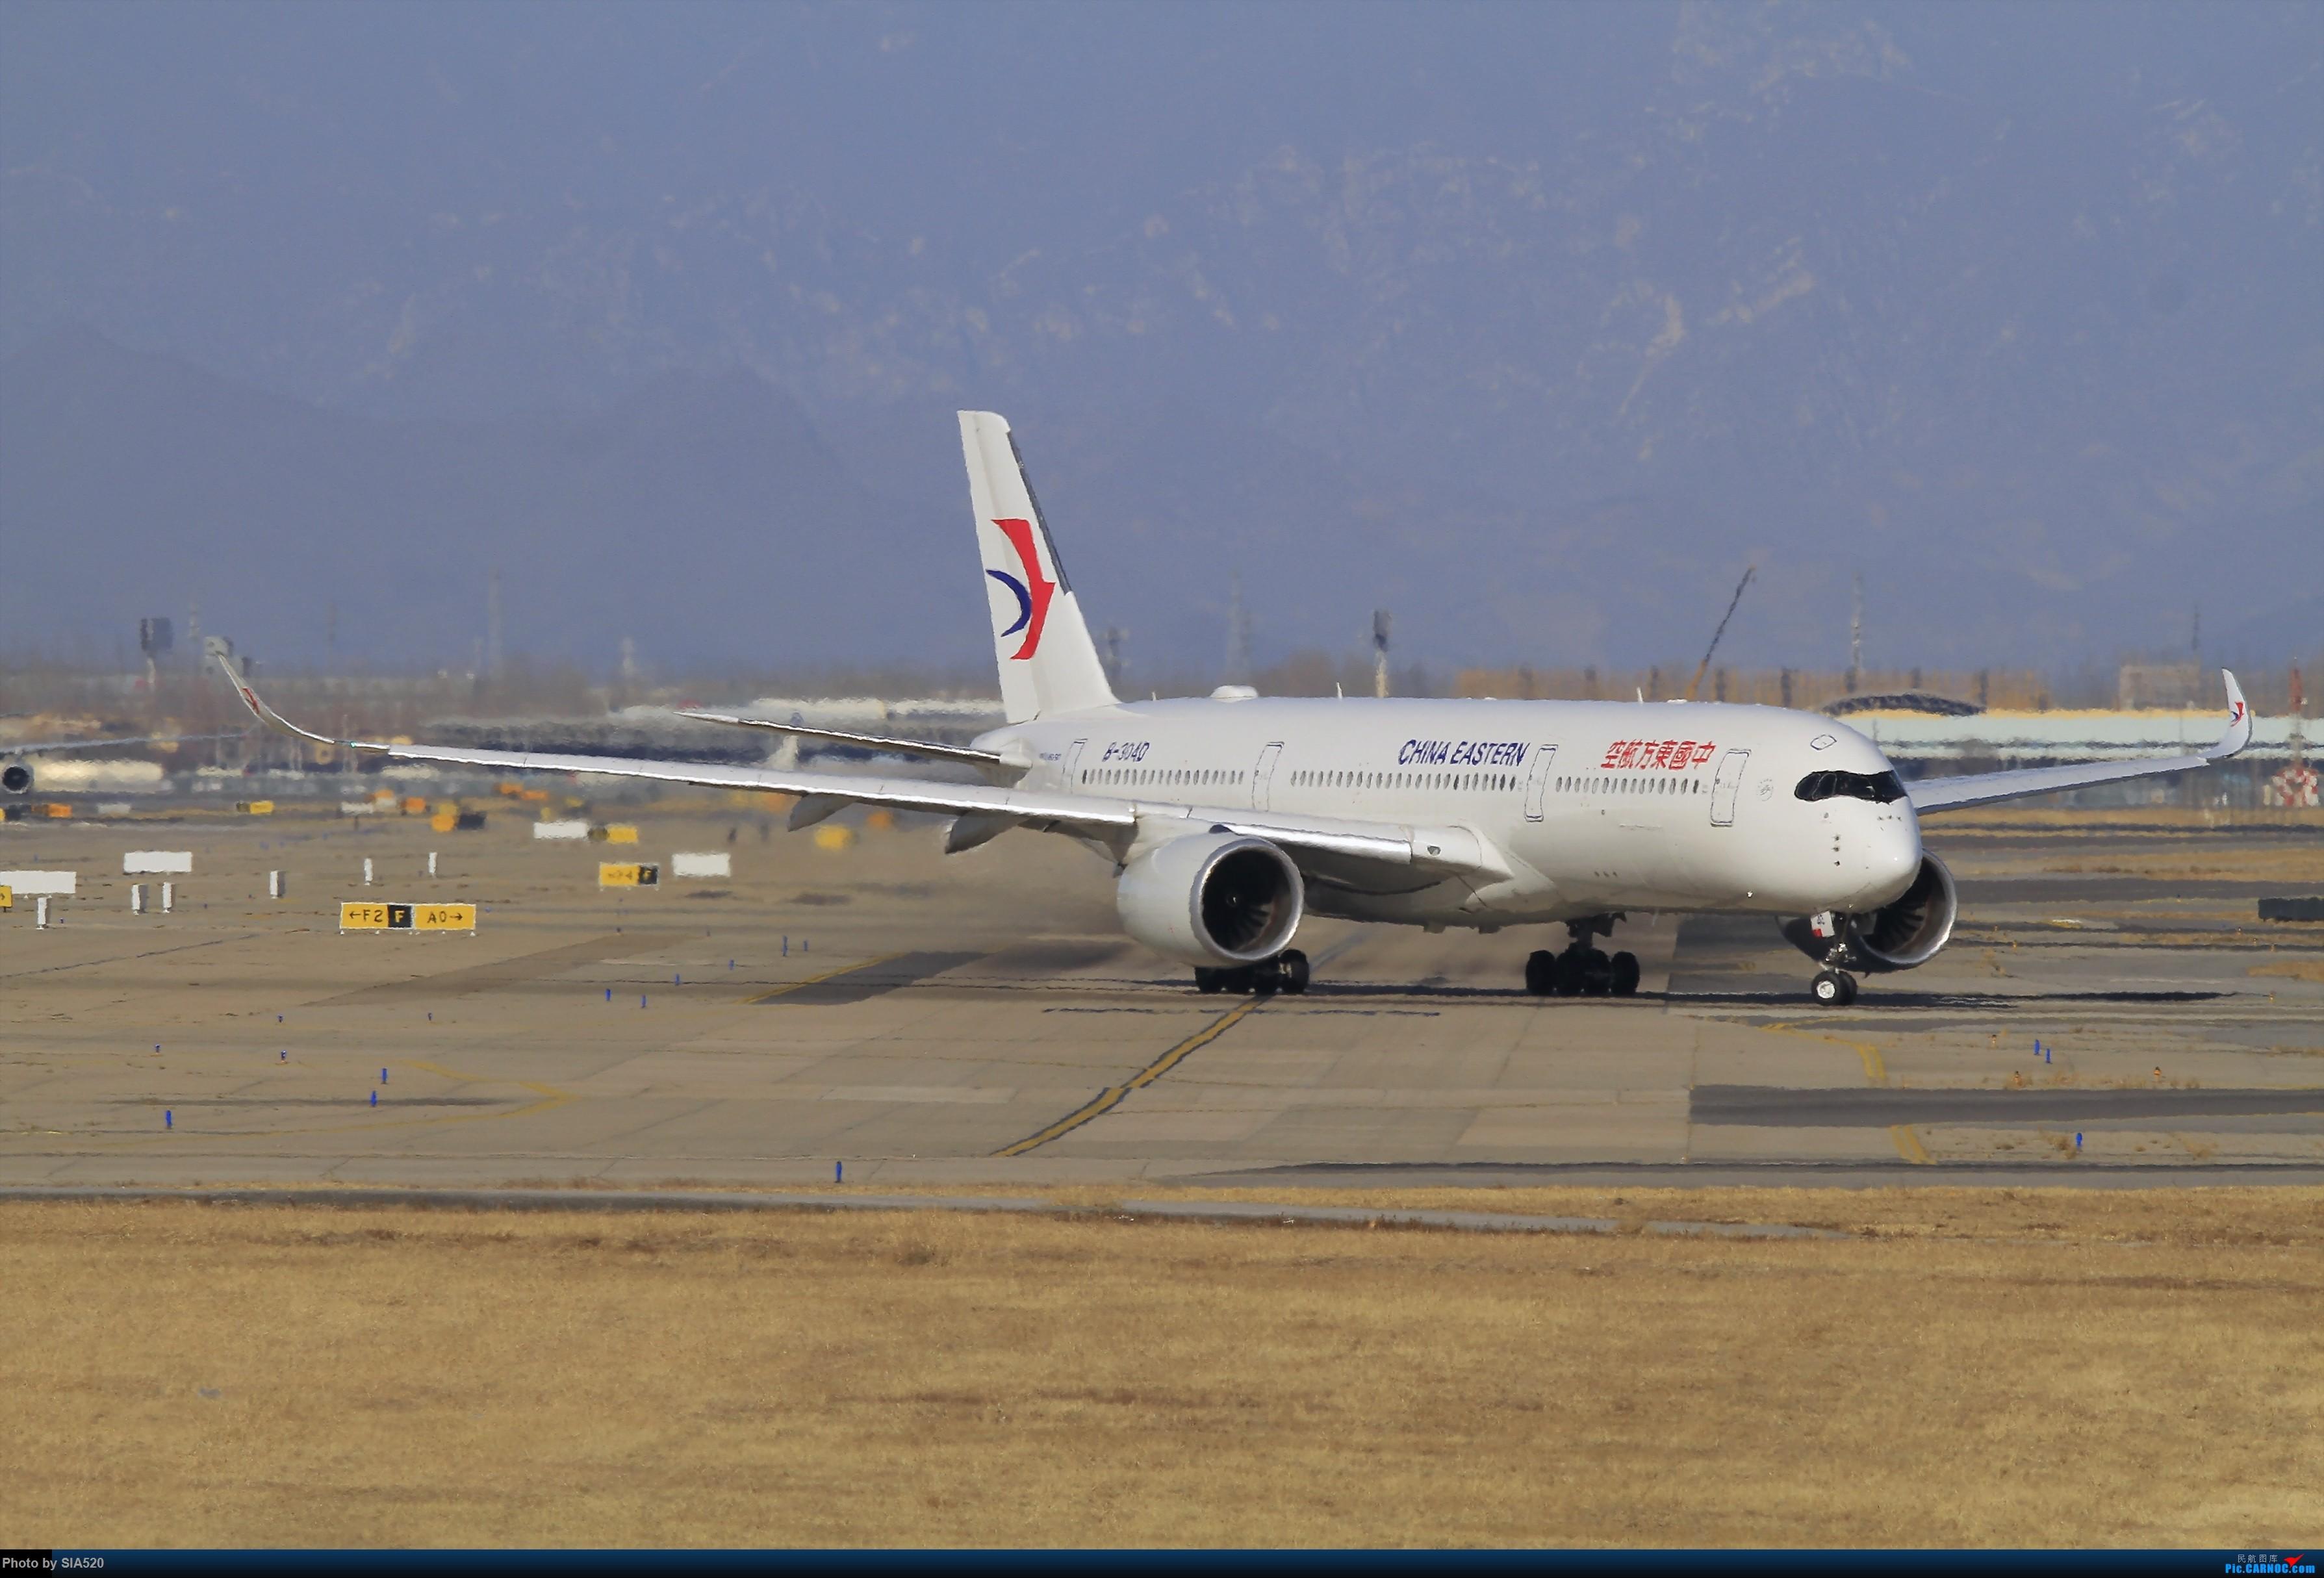 Re:[原创]六年流年留念—感谢自己坚守 感谢所有人 AIRBUS A350-900 B-304D 中国北京首都国际机场